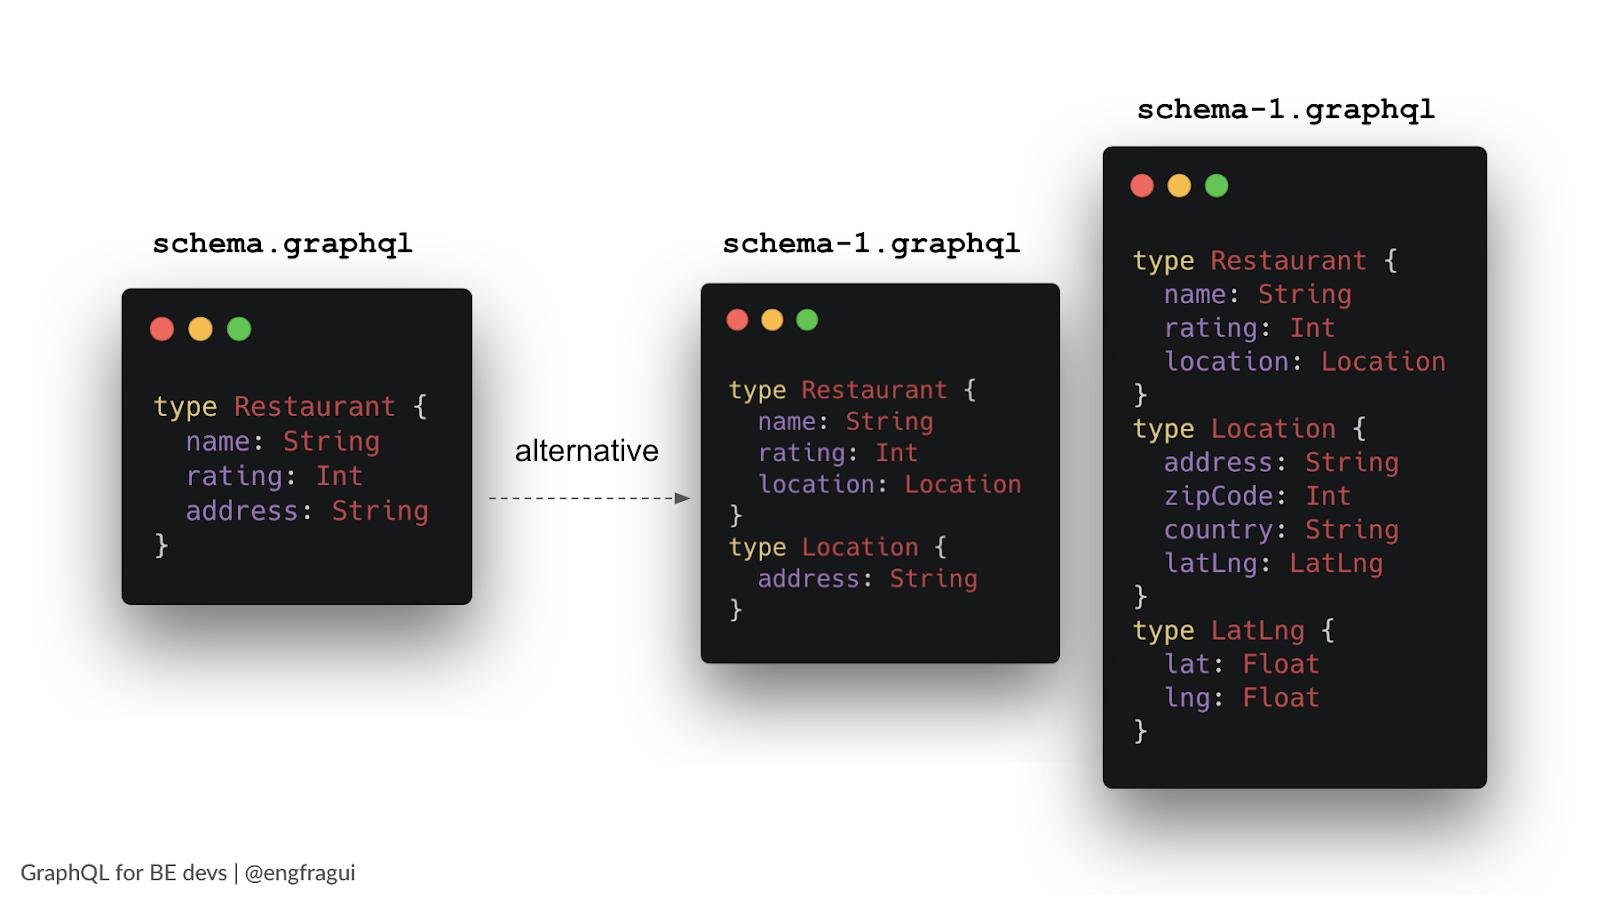 GraphQL schema basic type, alternative types, and more detailing information